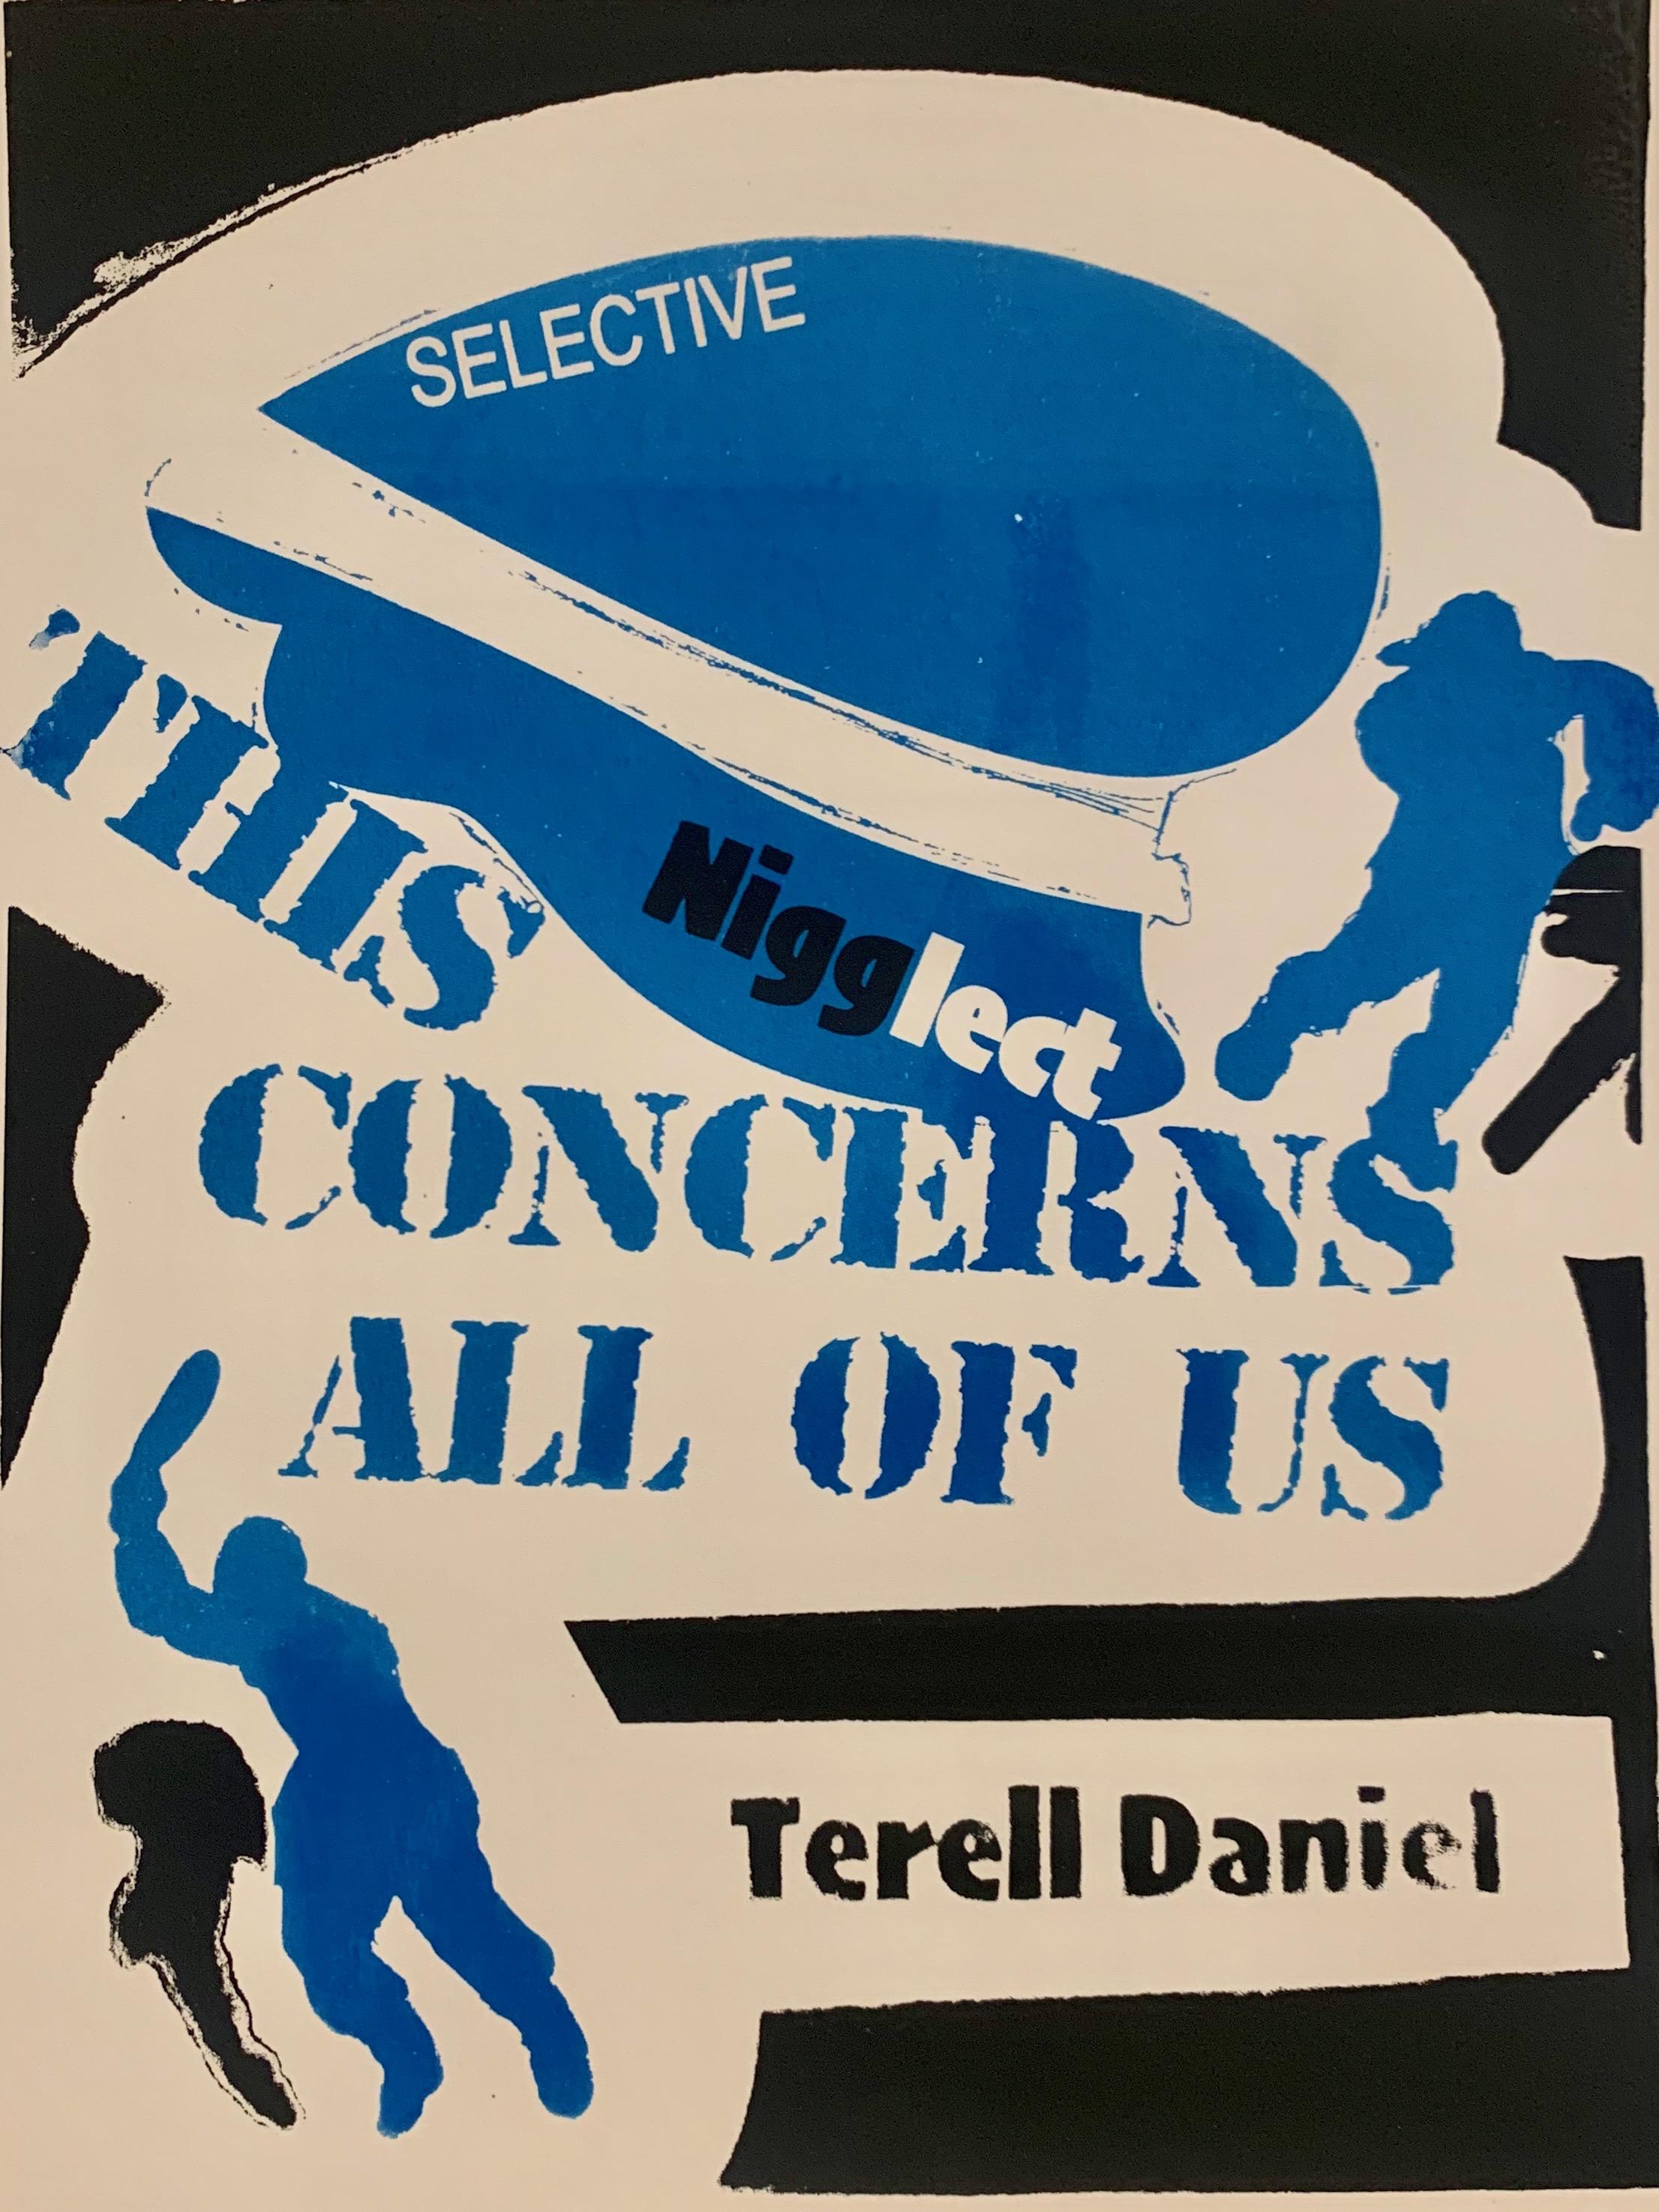 Terell Daniel